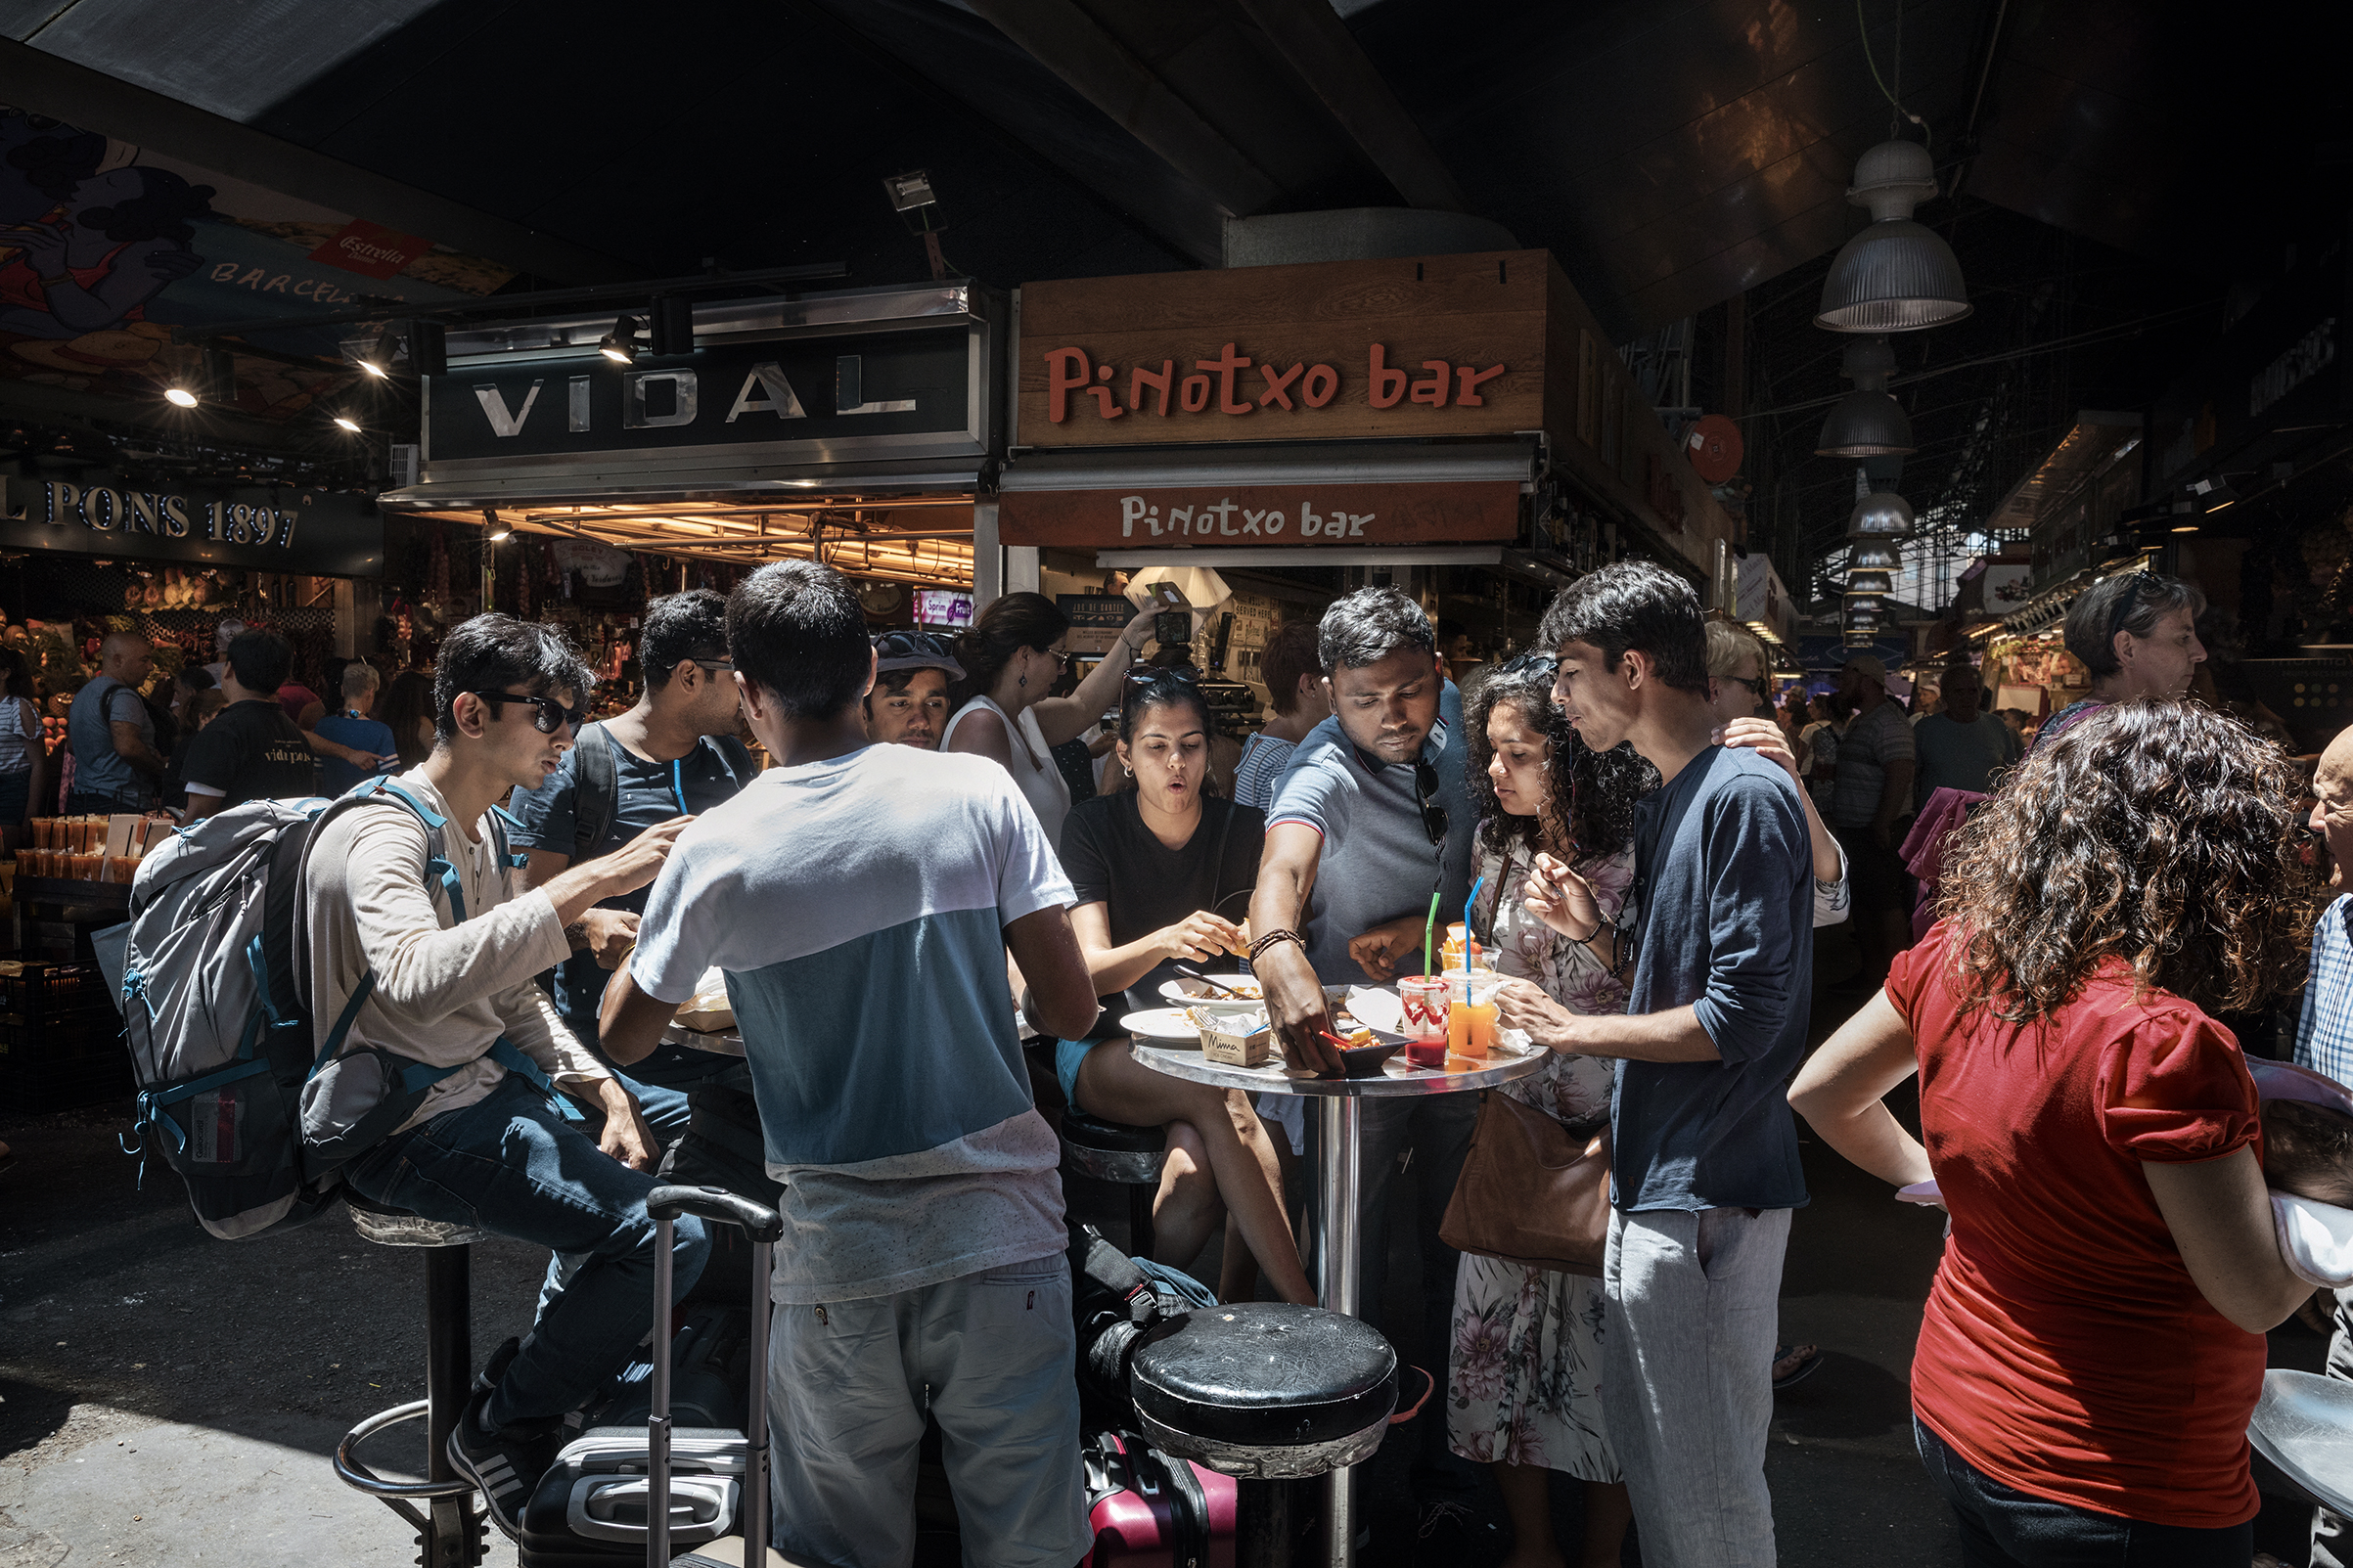 Barcelona now limits tour-group access to the Boquería market